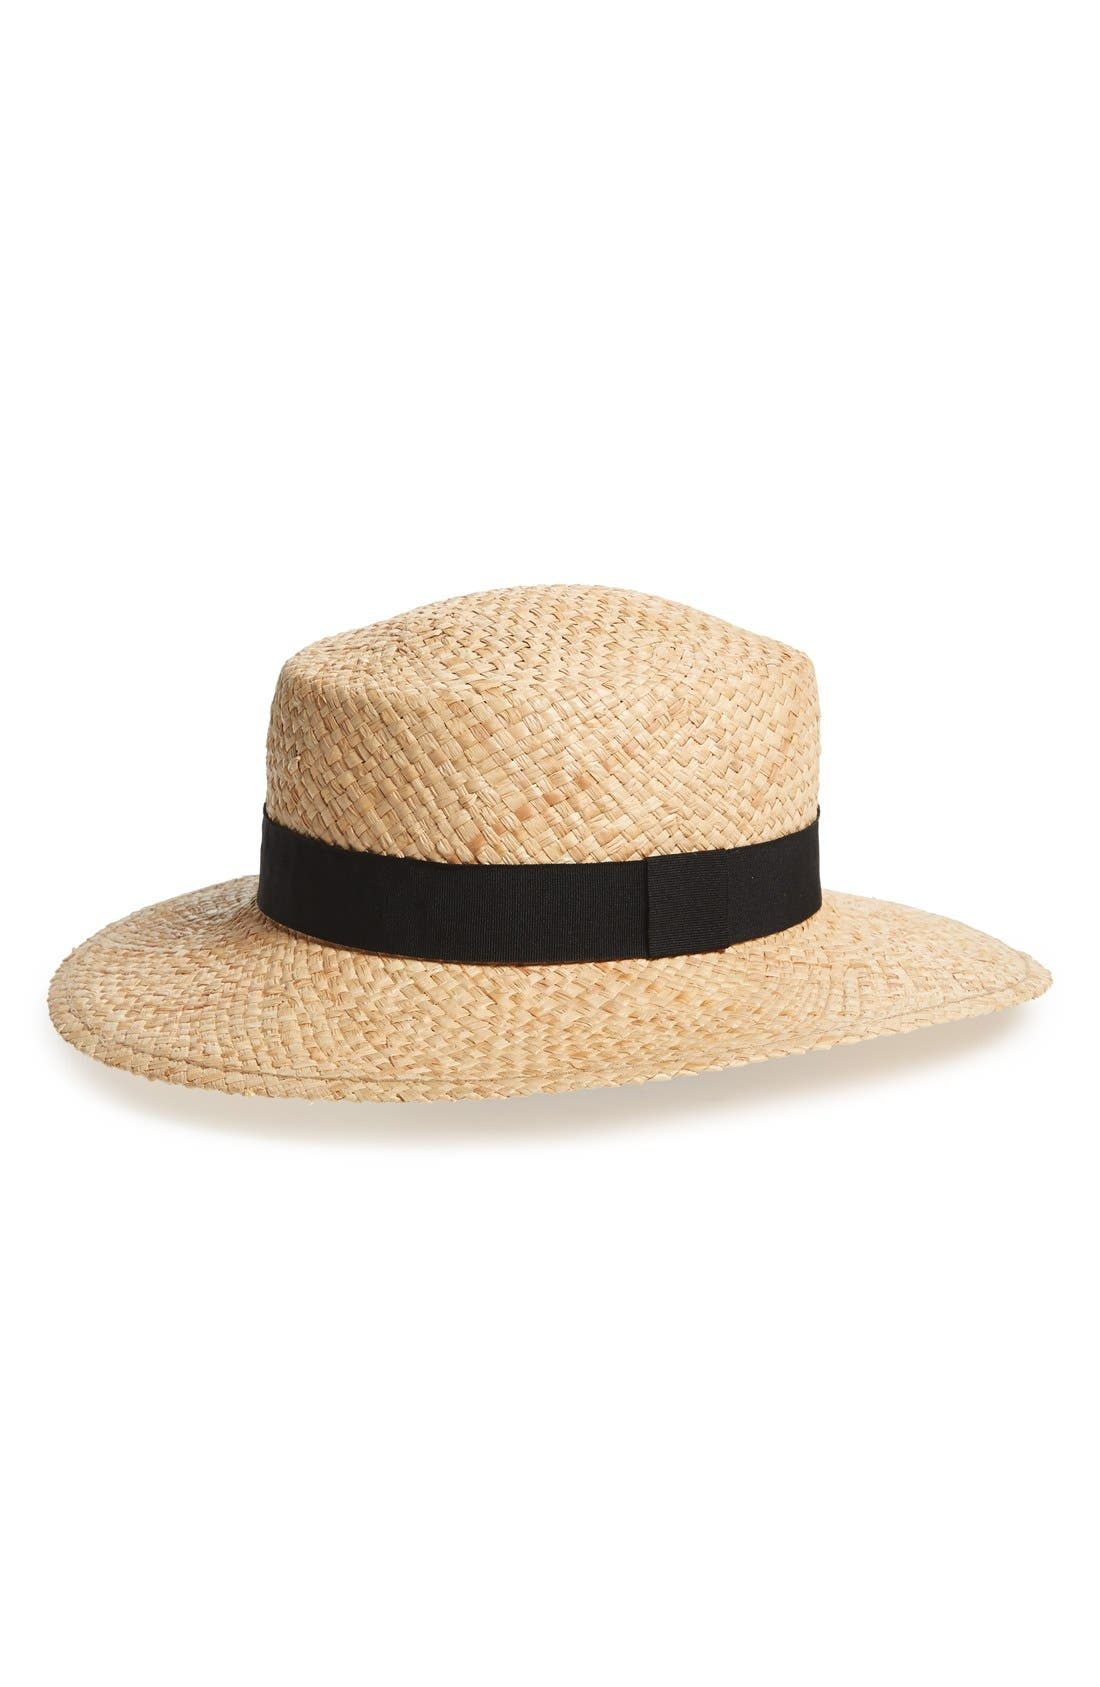 Main Image - BP. Woven Raffia Boater Hat